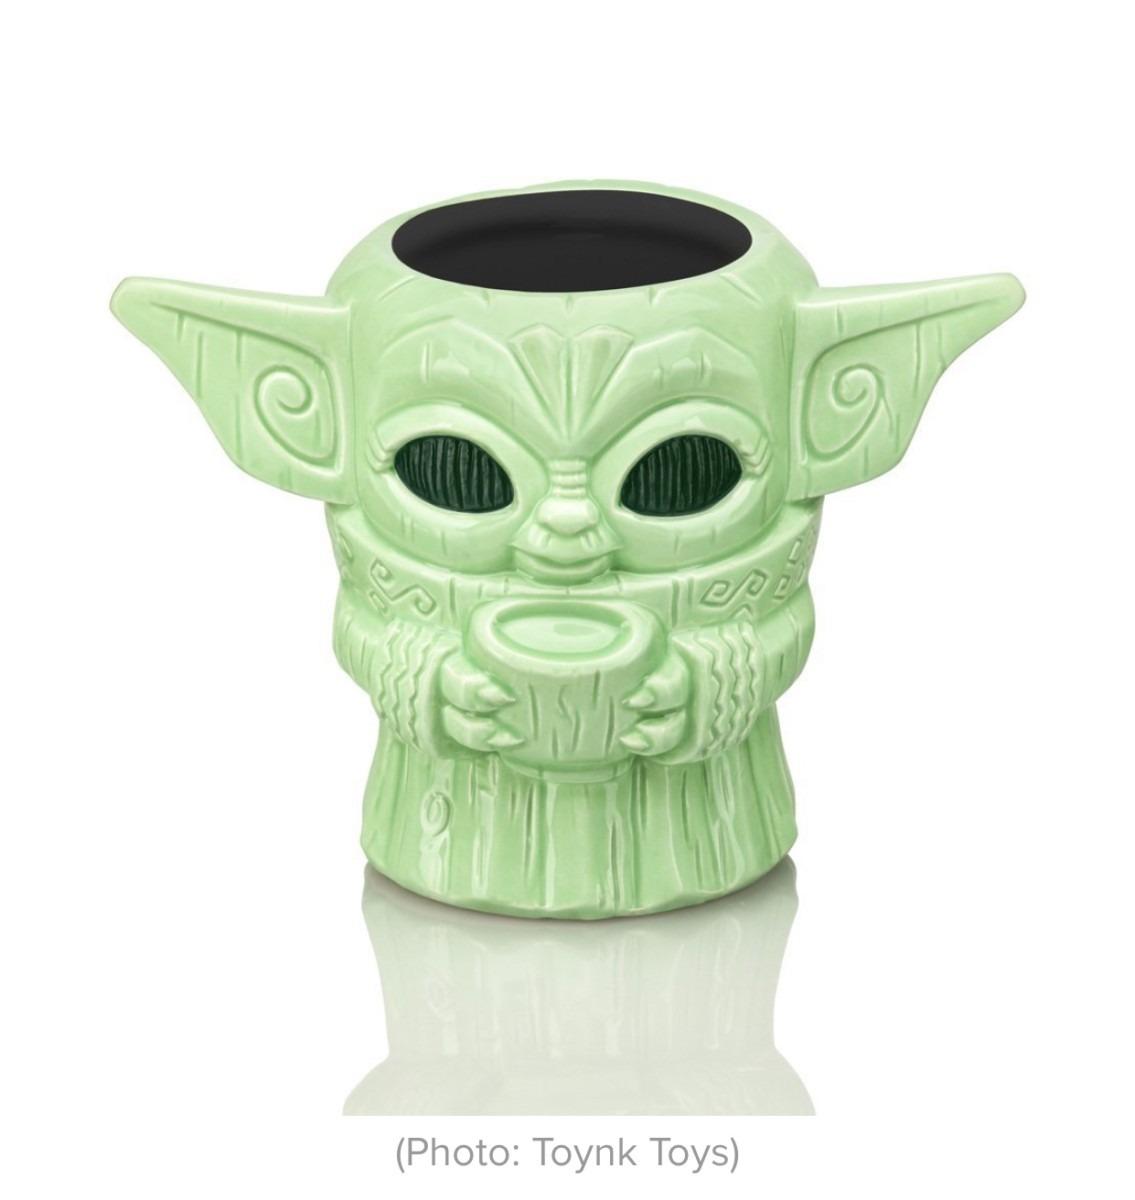 Star Wars: Baby Yoda Gets His Own Tiki Mug! 1